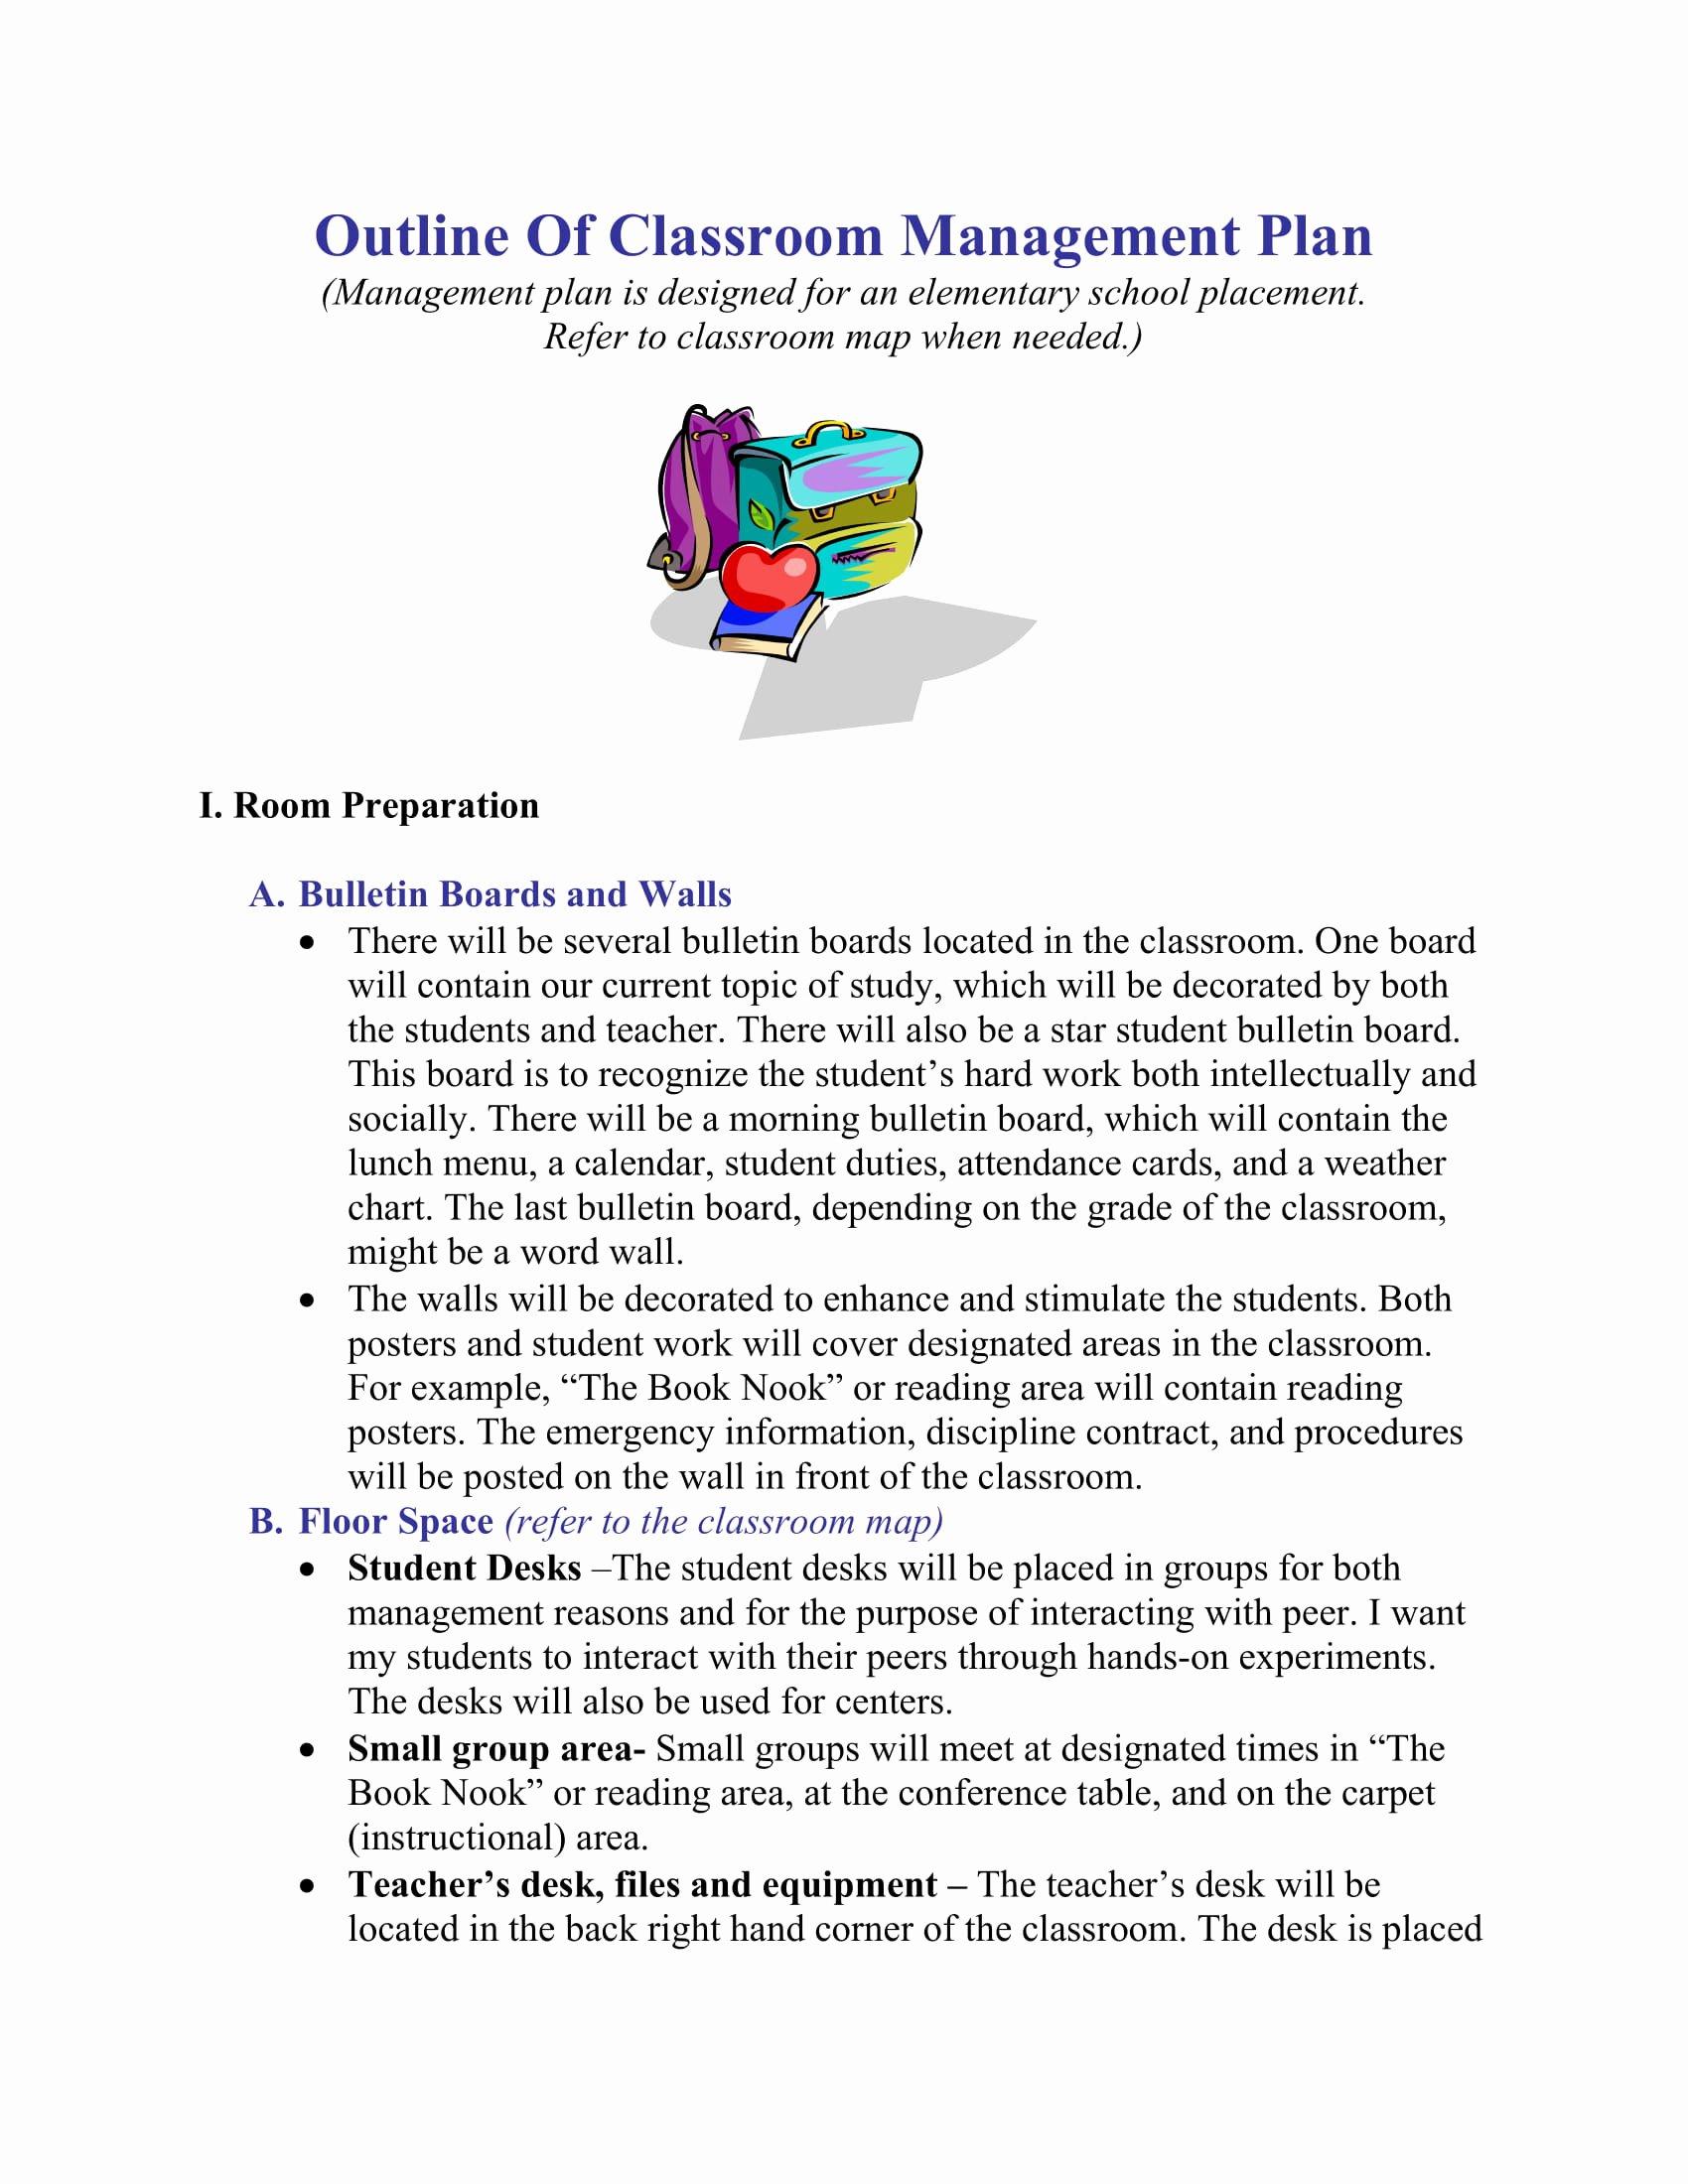 Classroom Management Plan Template Beautiful Classroom Management Plan Template